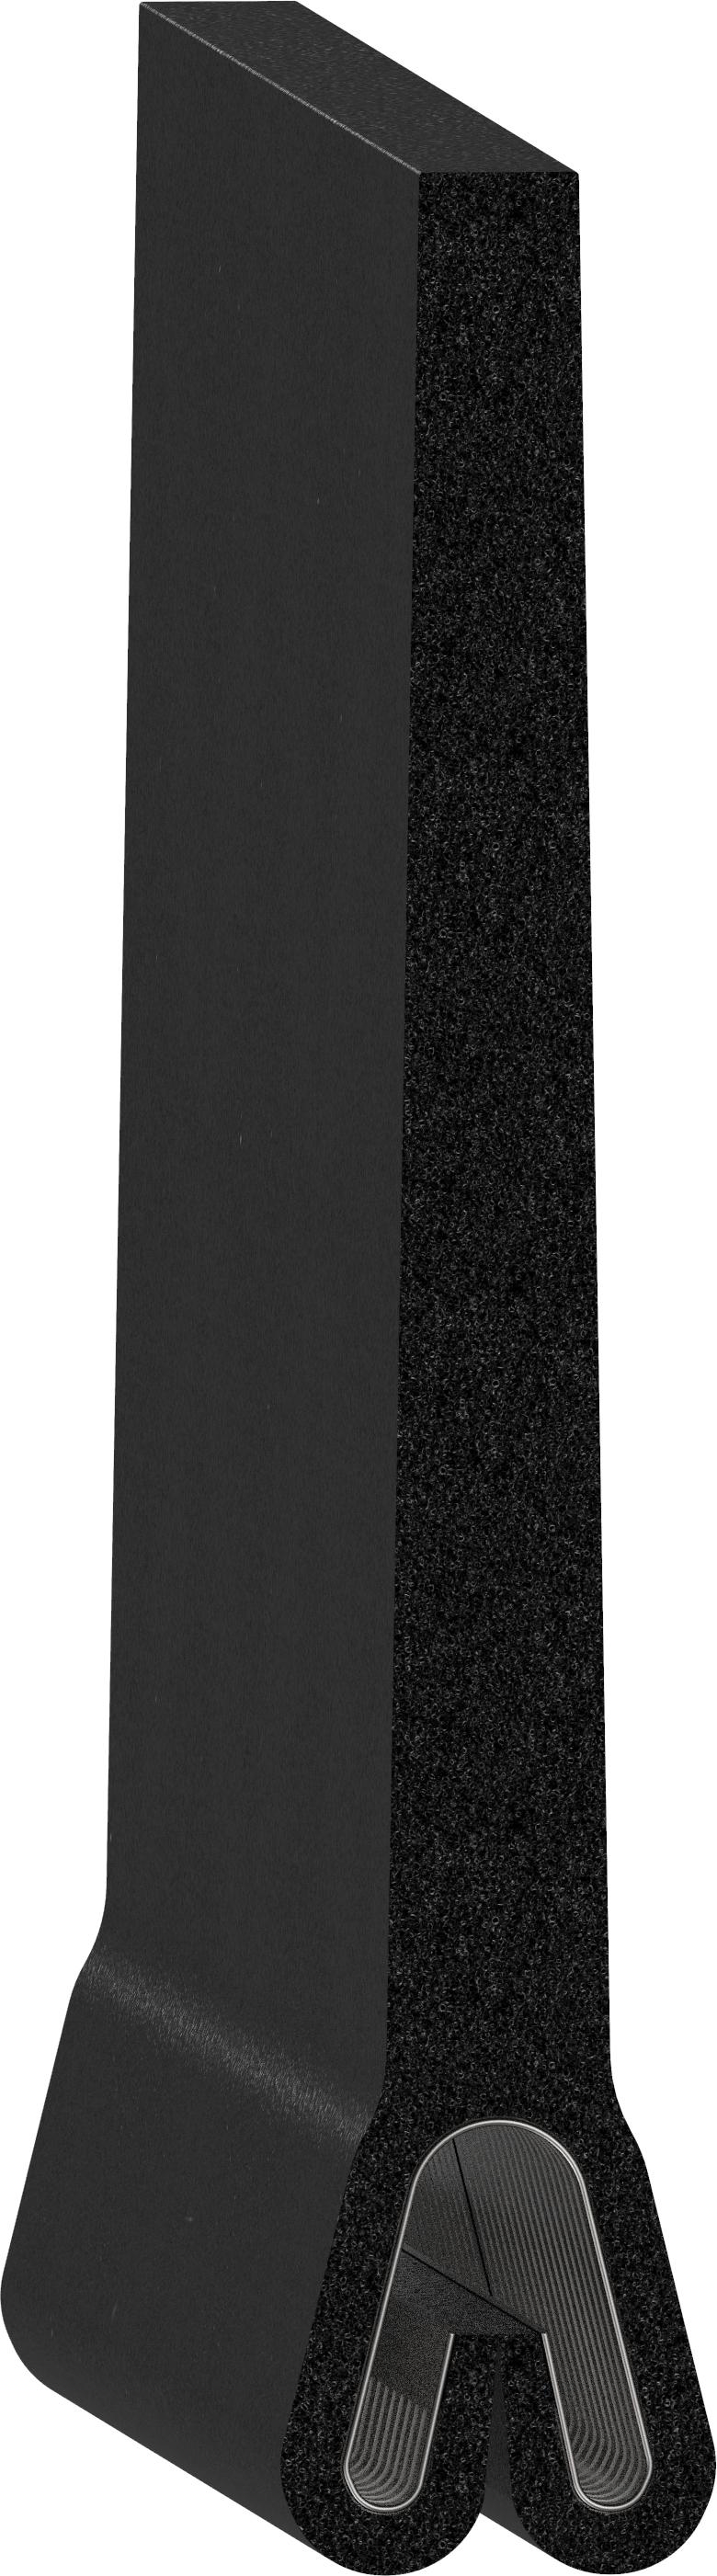 Uni-Grip part: ED-5250